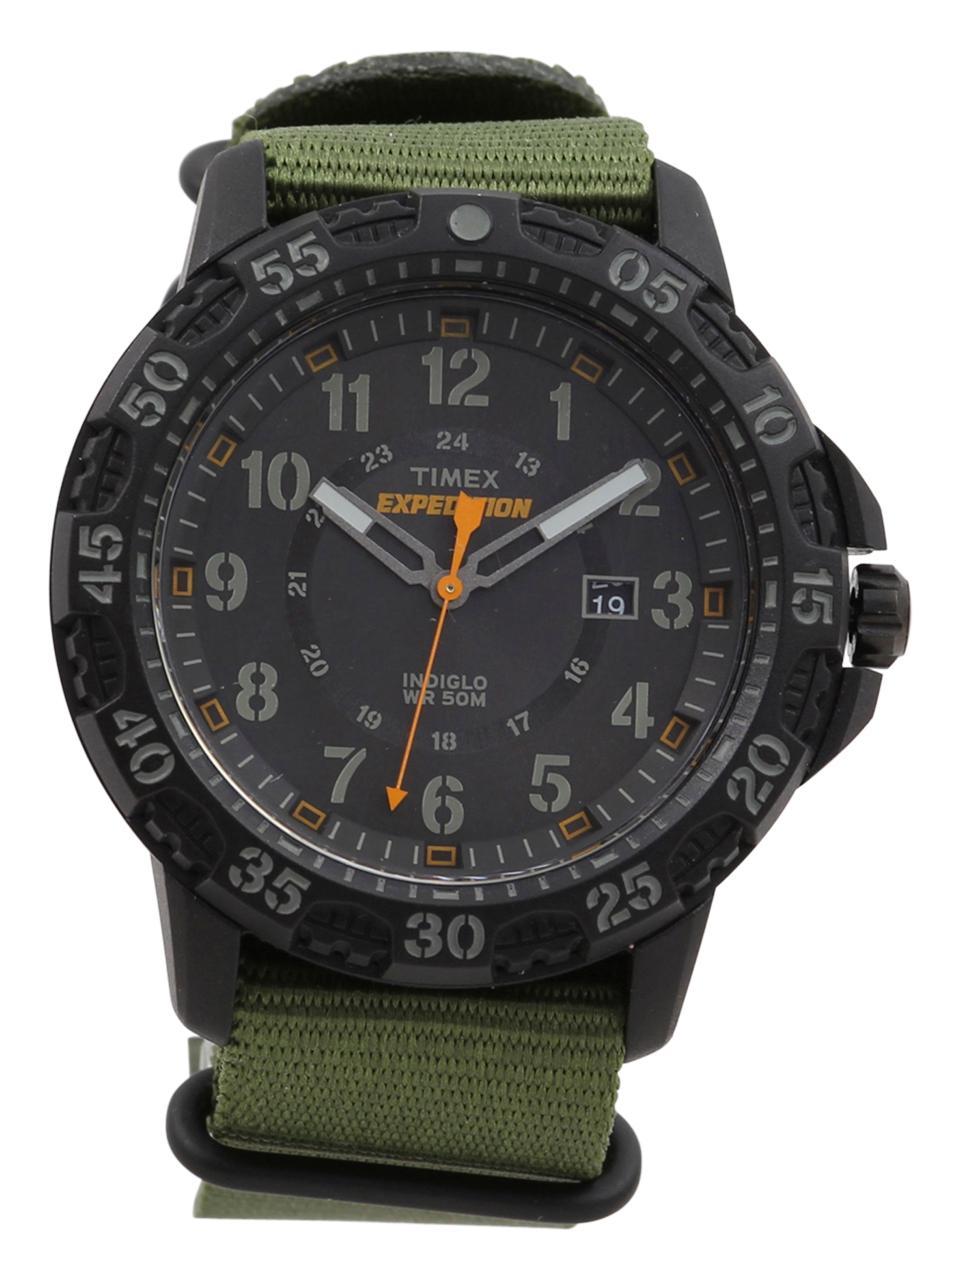 Timex Men s TW4B03600 Expedition Black Analog Watch